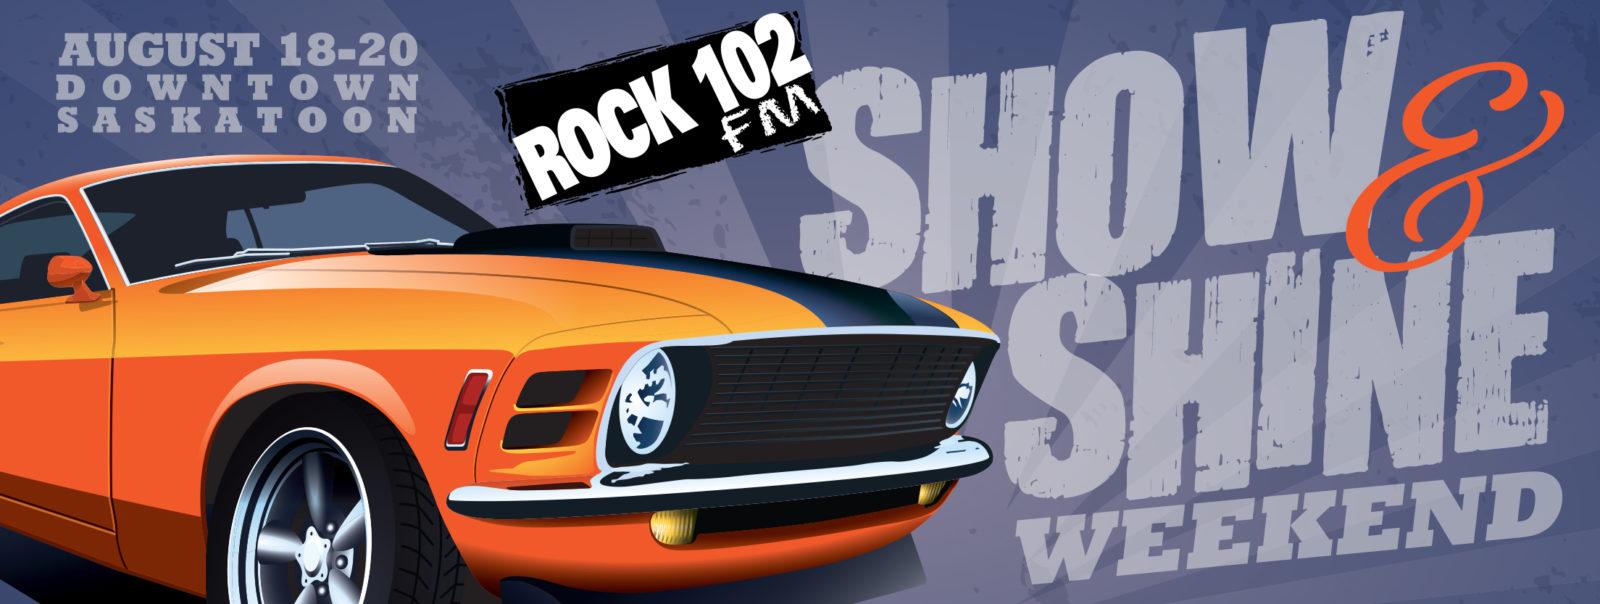 2017-rock-102-show-shine-slide